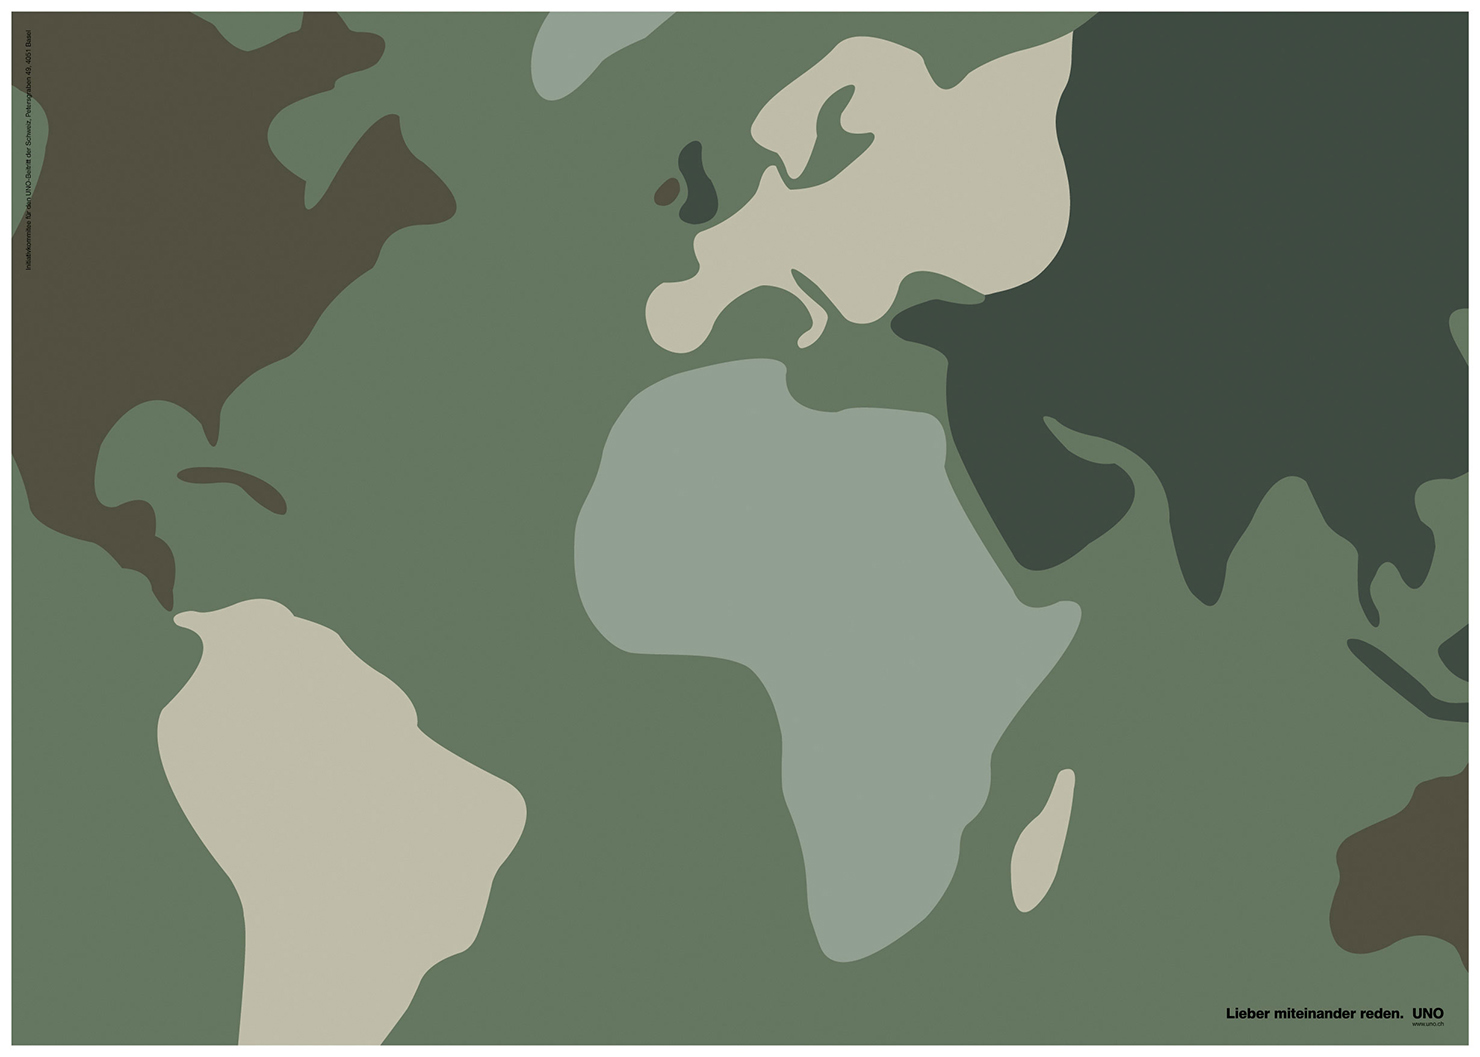 Anzeige_UNO_United-Nations-1-2